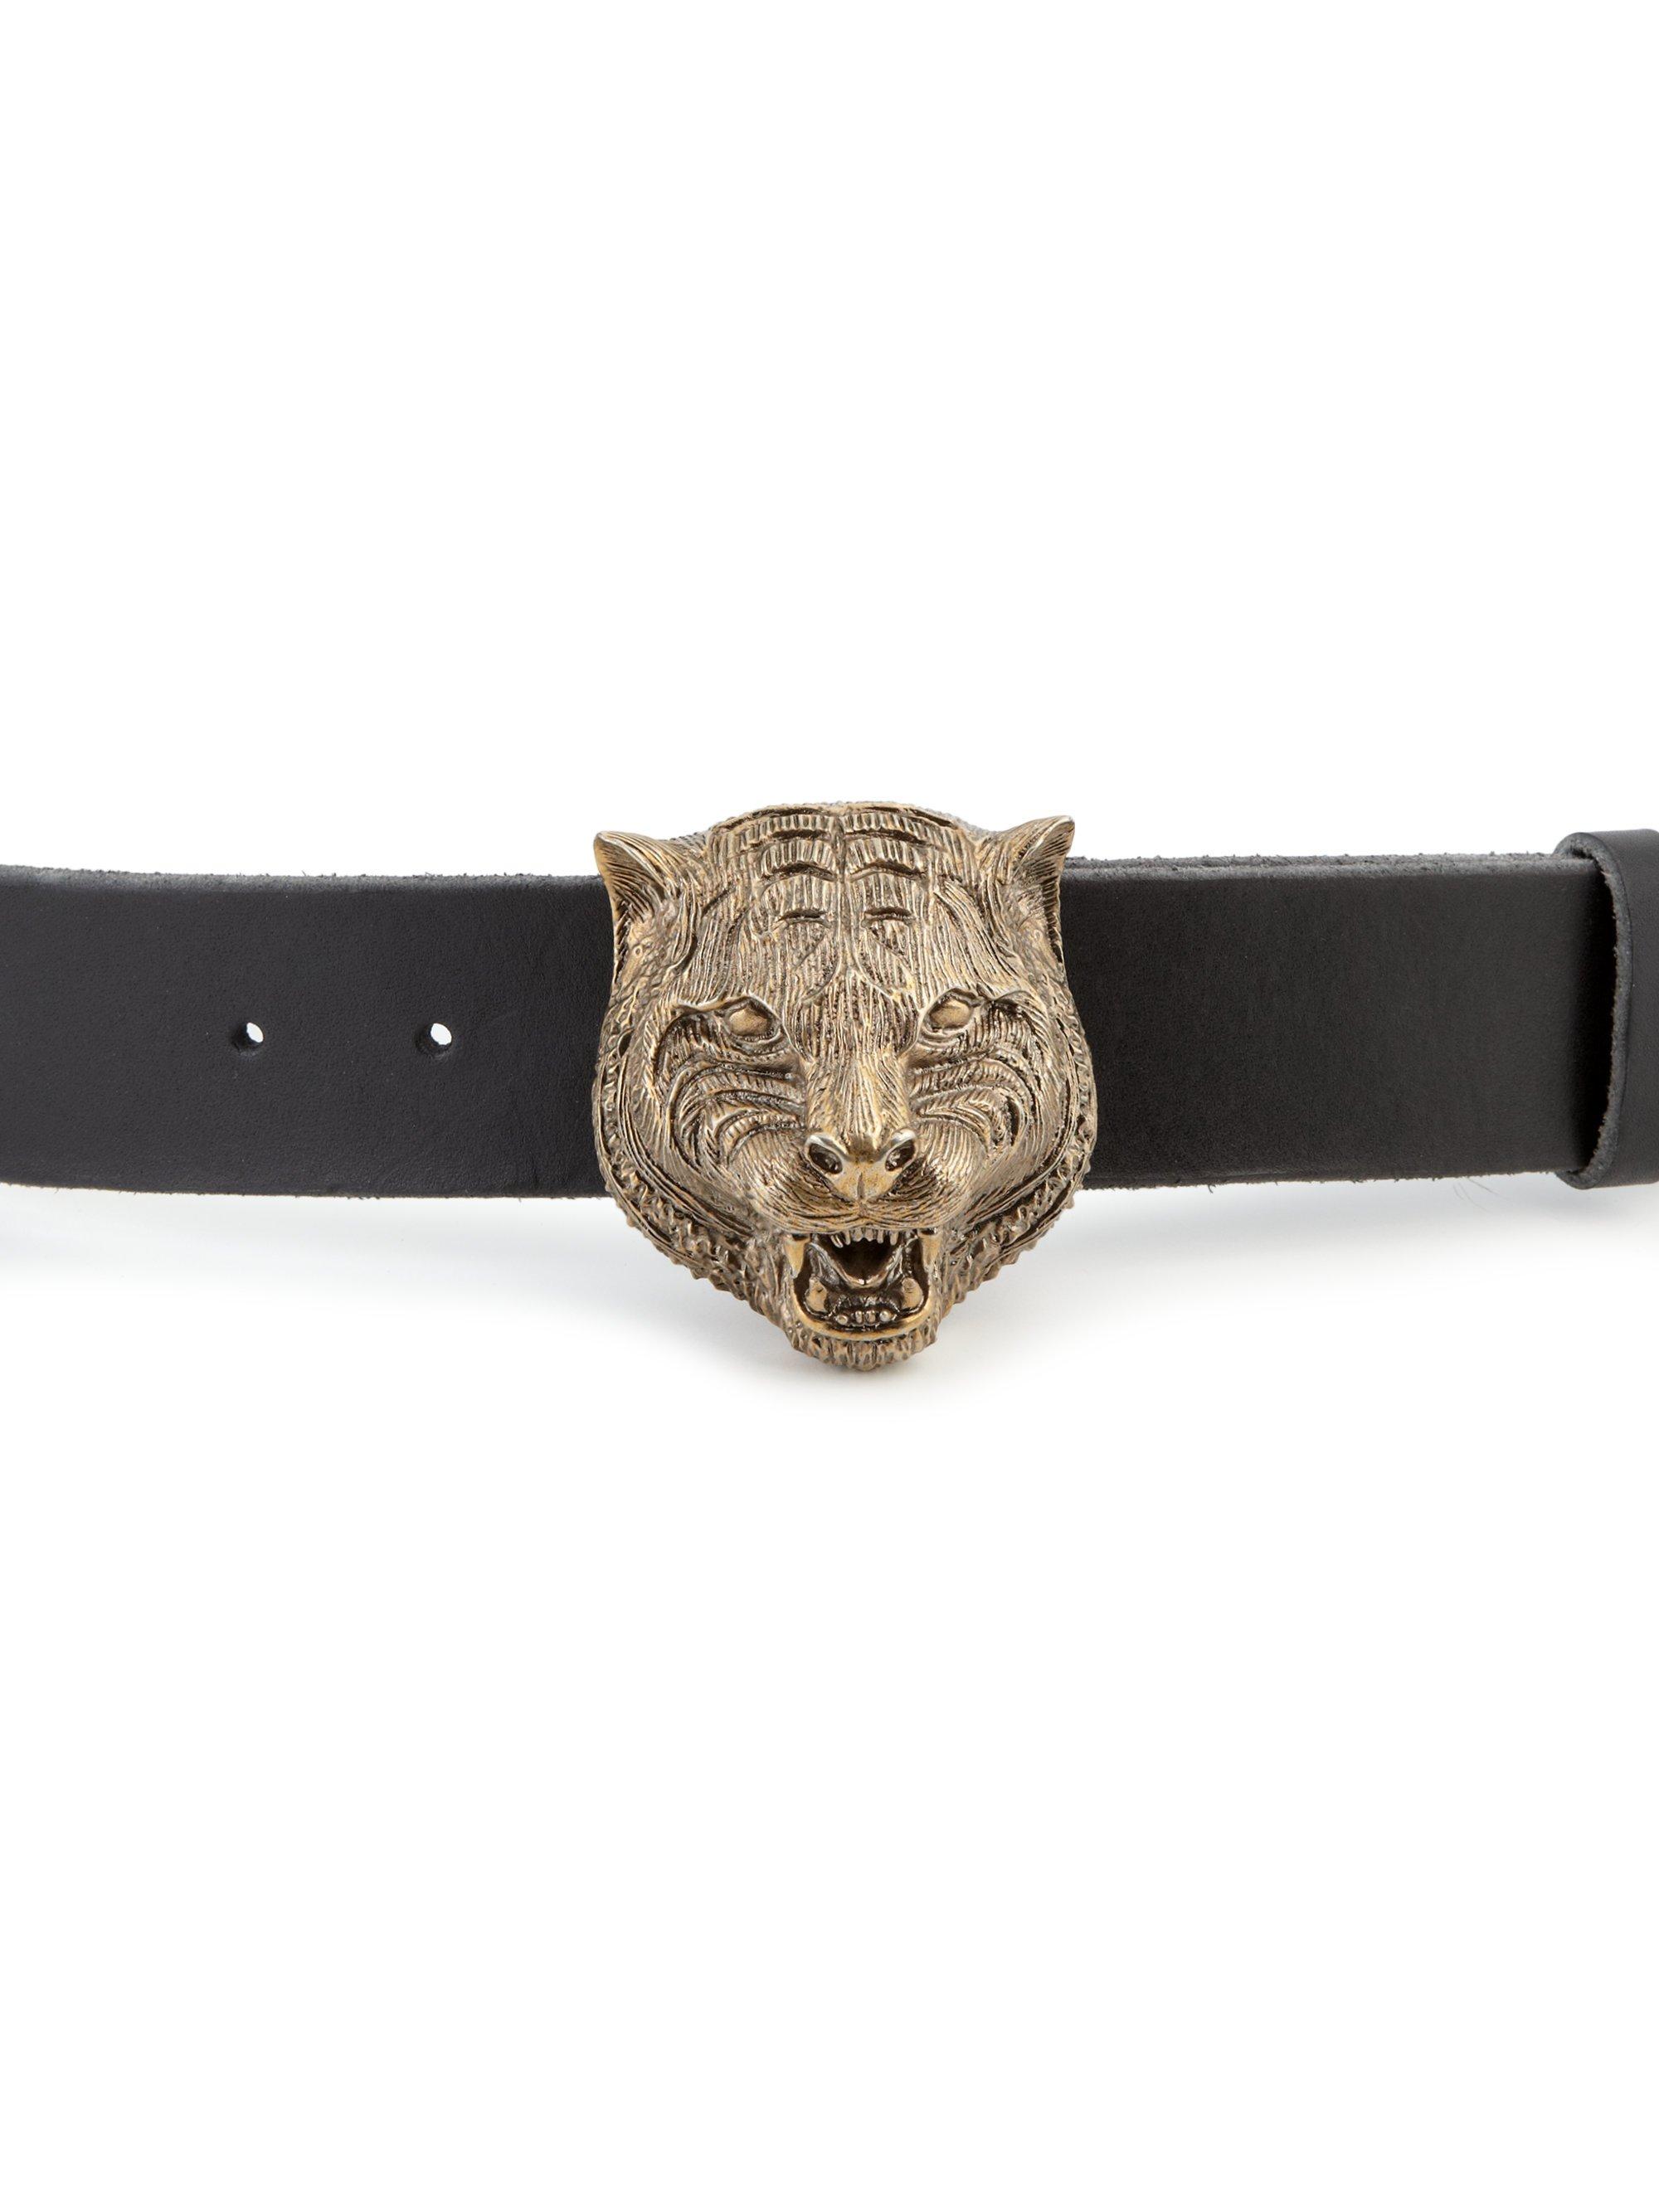 d7a552adf89 Lyst - Gucci Tiger Head Leather Belt in Black